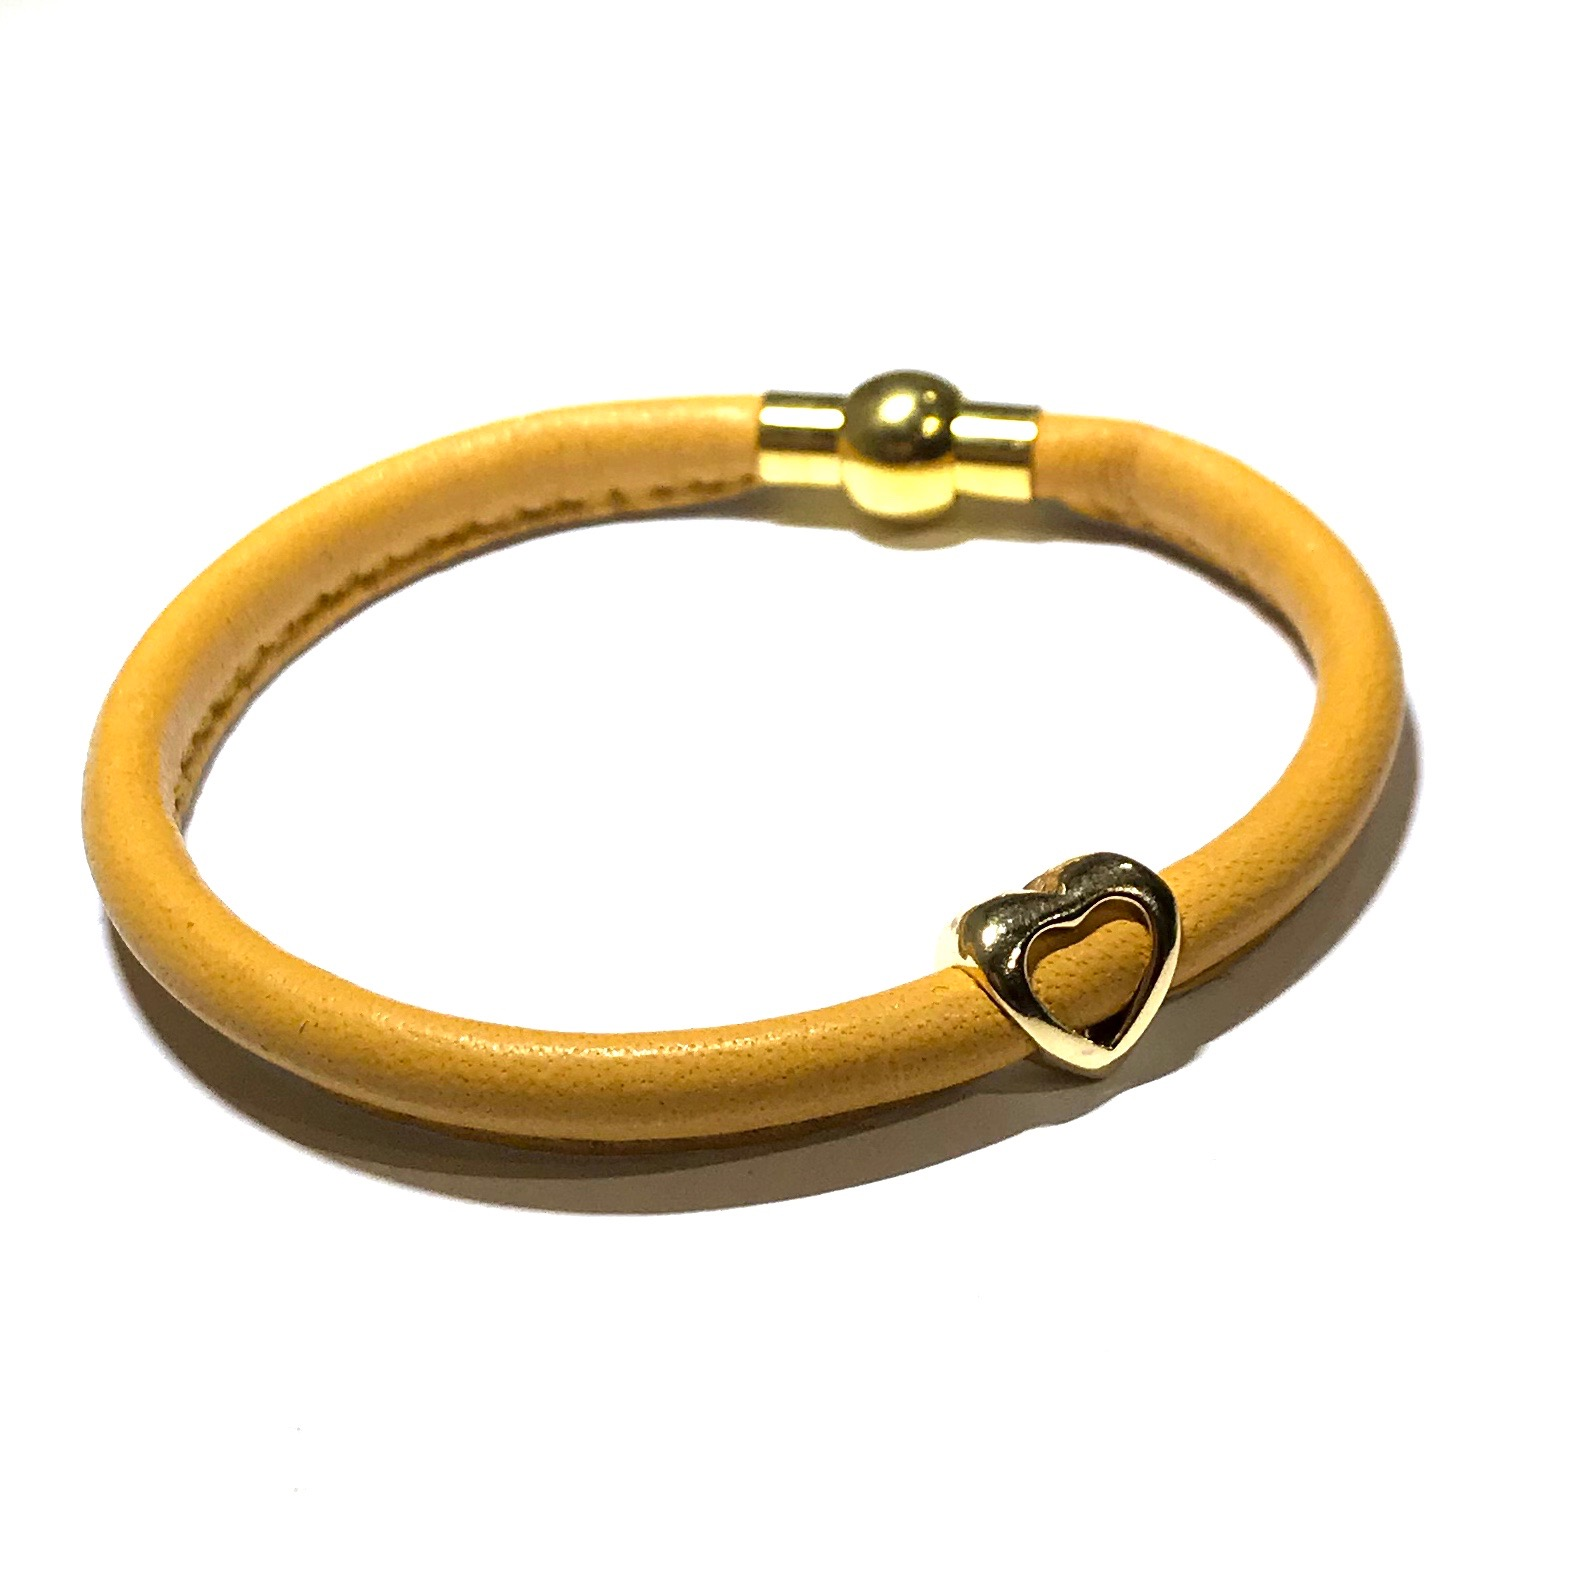 oker-gul-lammeskinn-lær-hjerte-armbånd